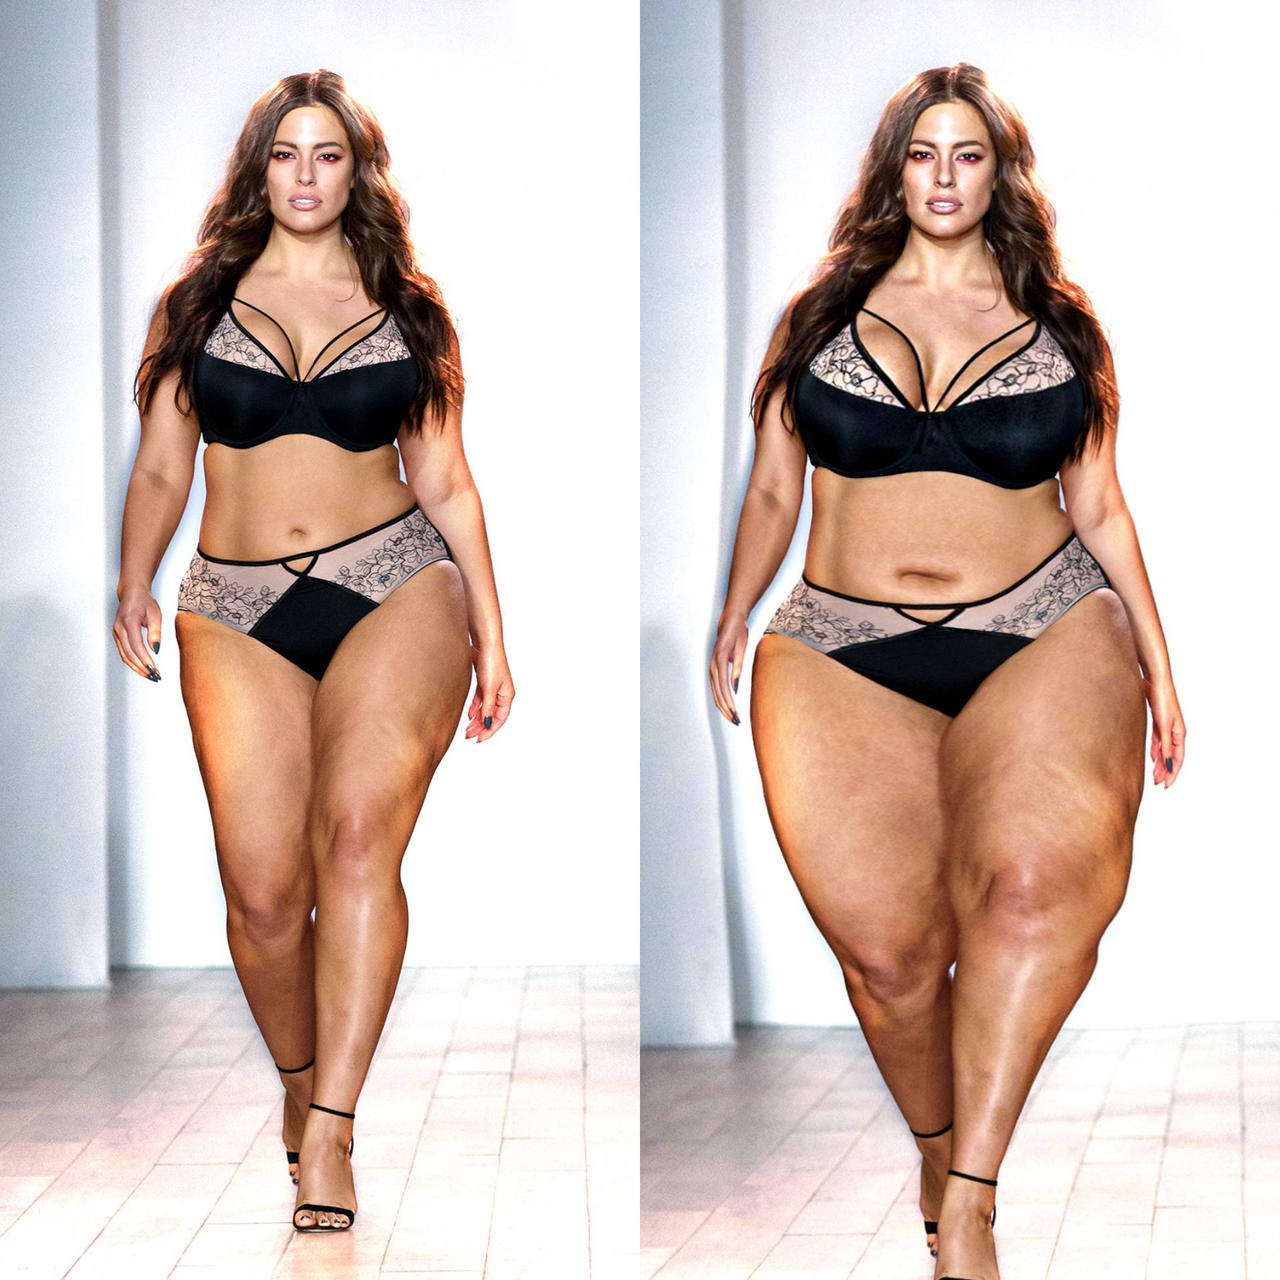 ashley graham weight